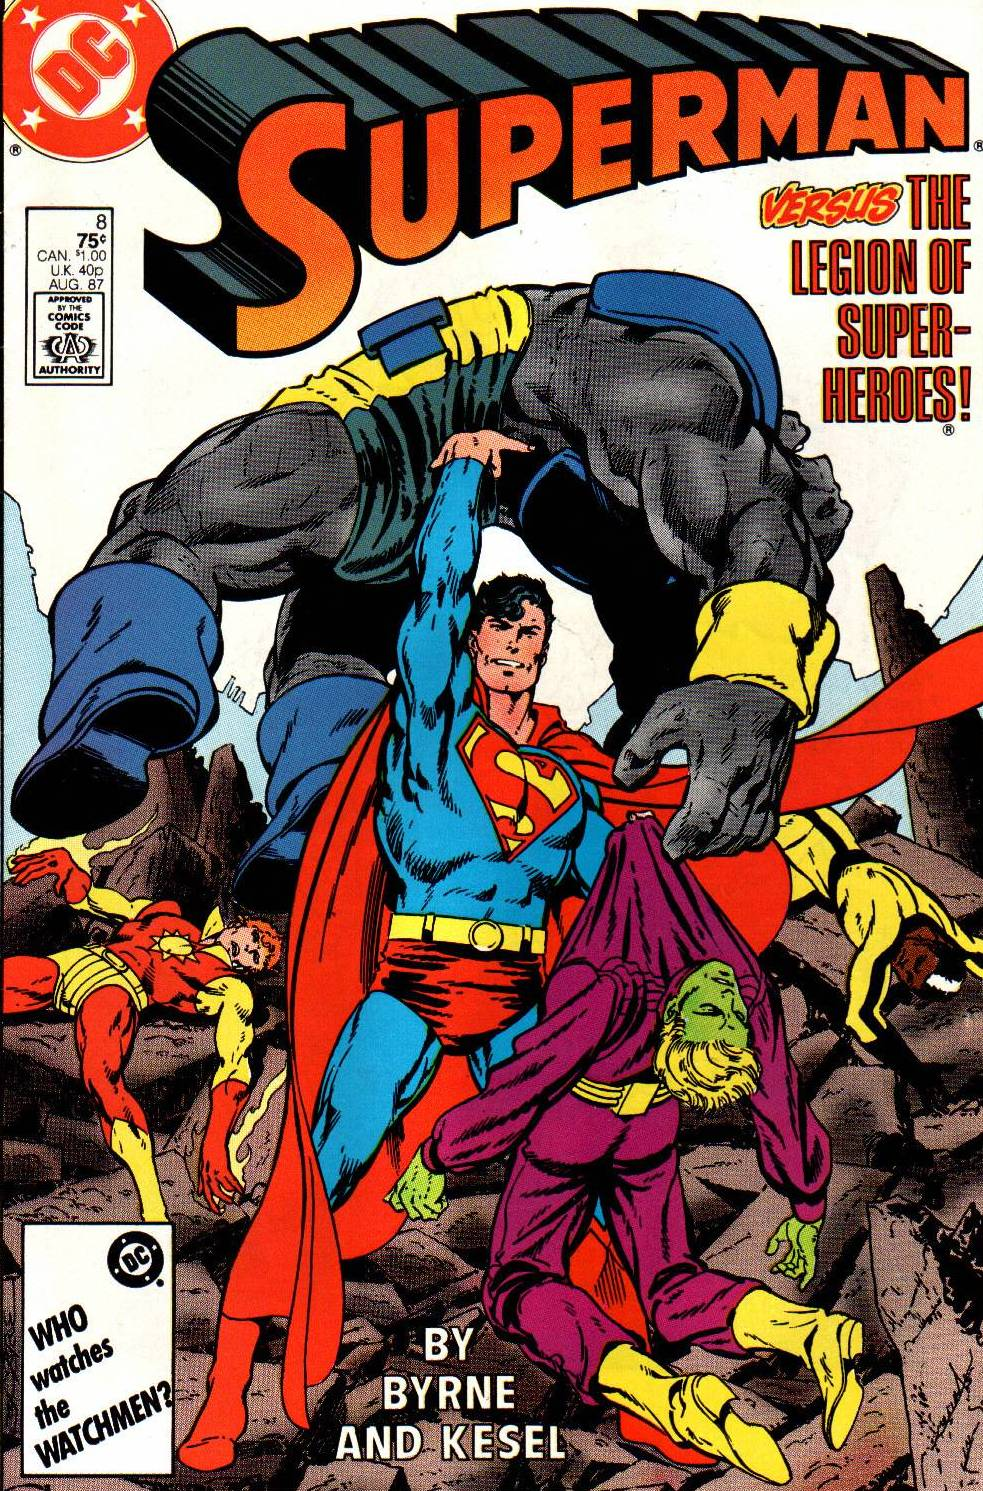 Supermanv2_008